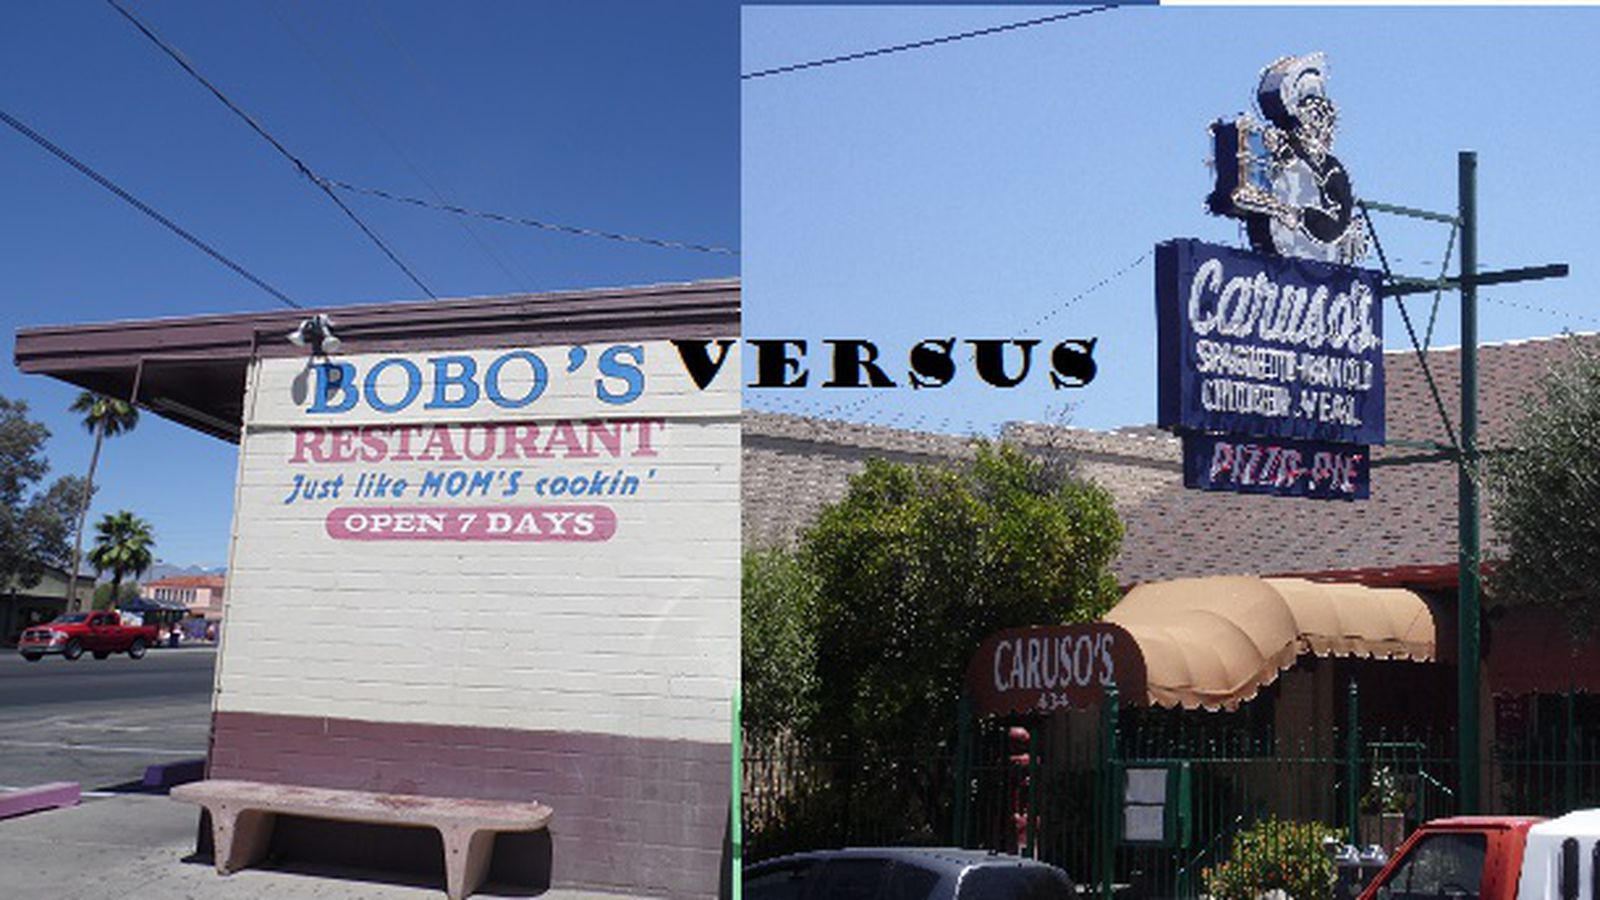 Bobo_s_vs._caruso_s.0.0